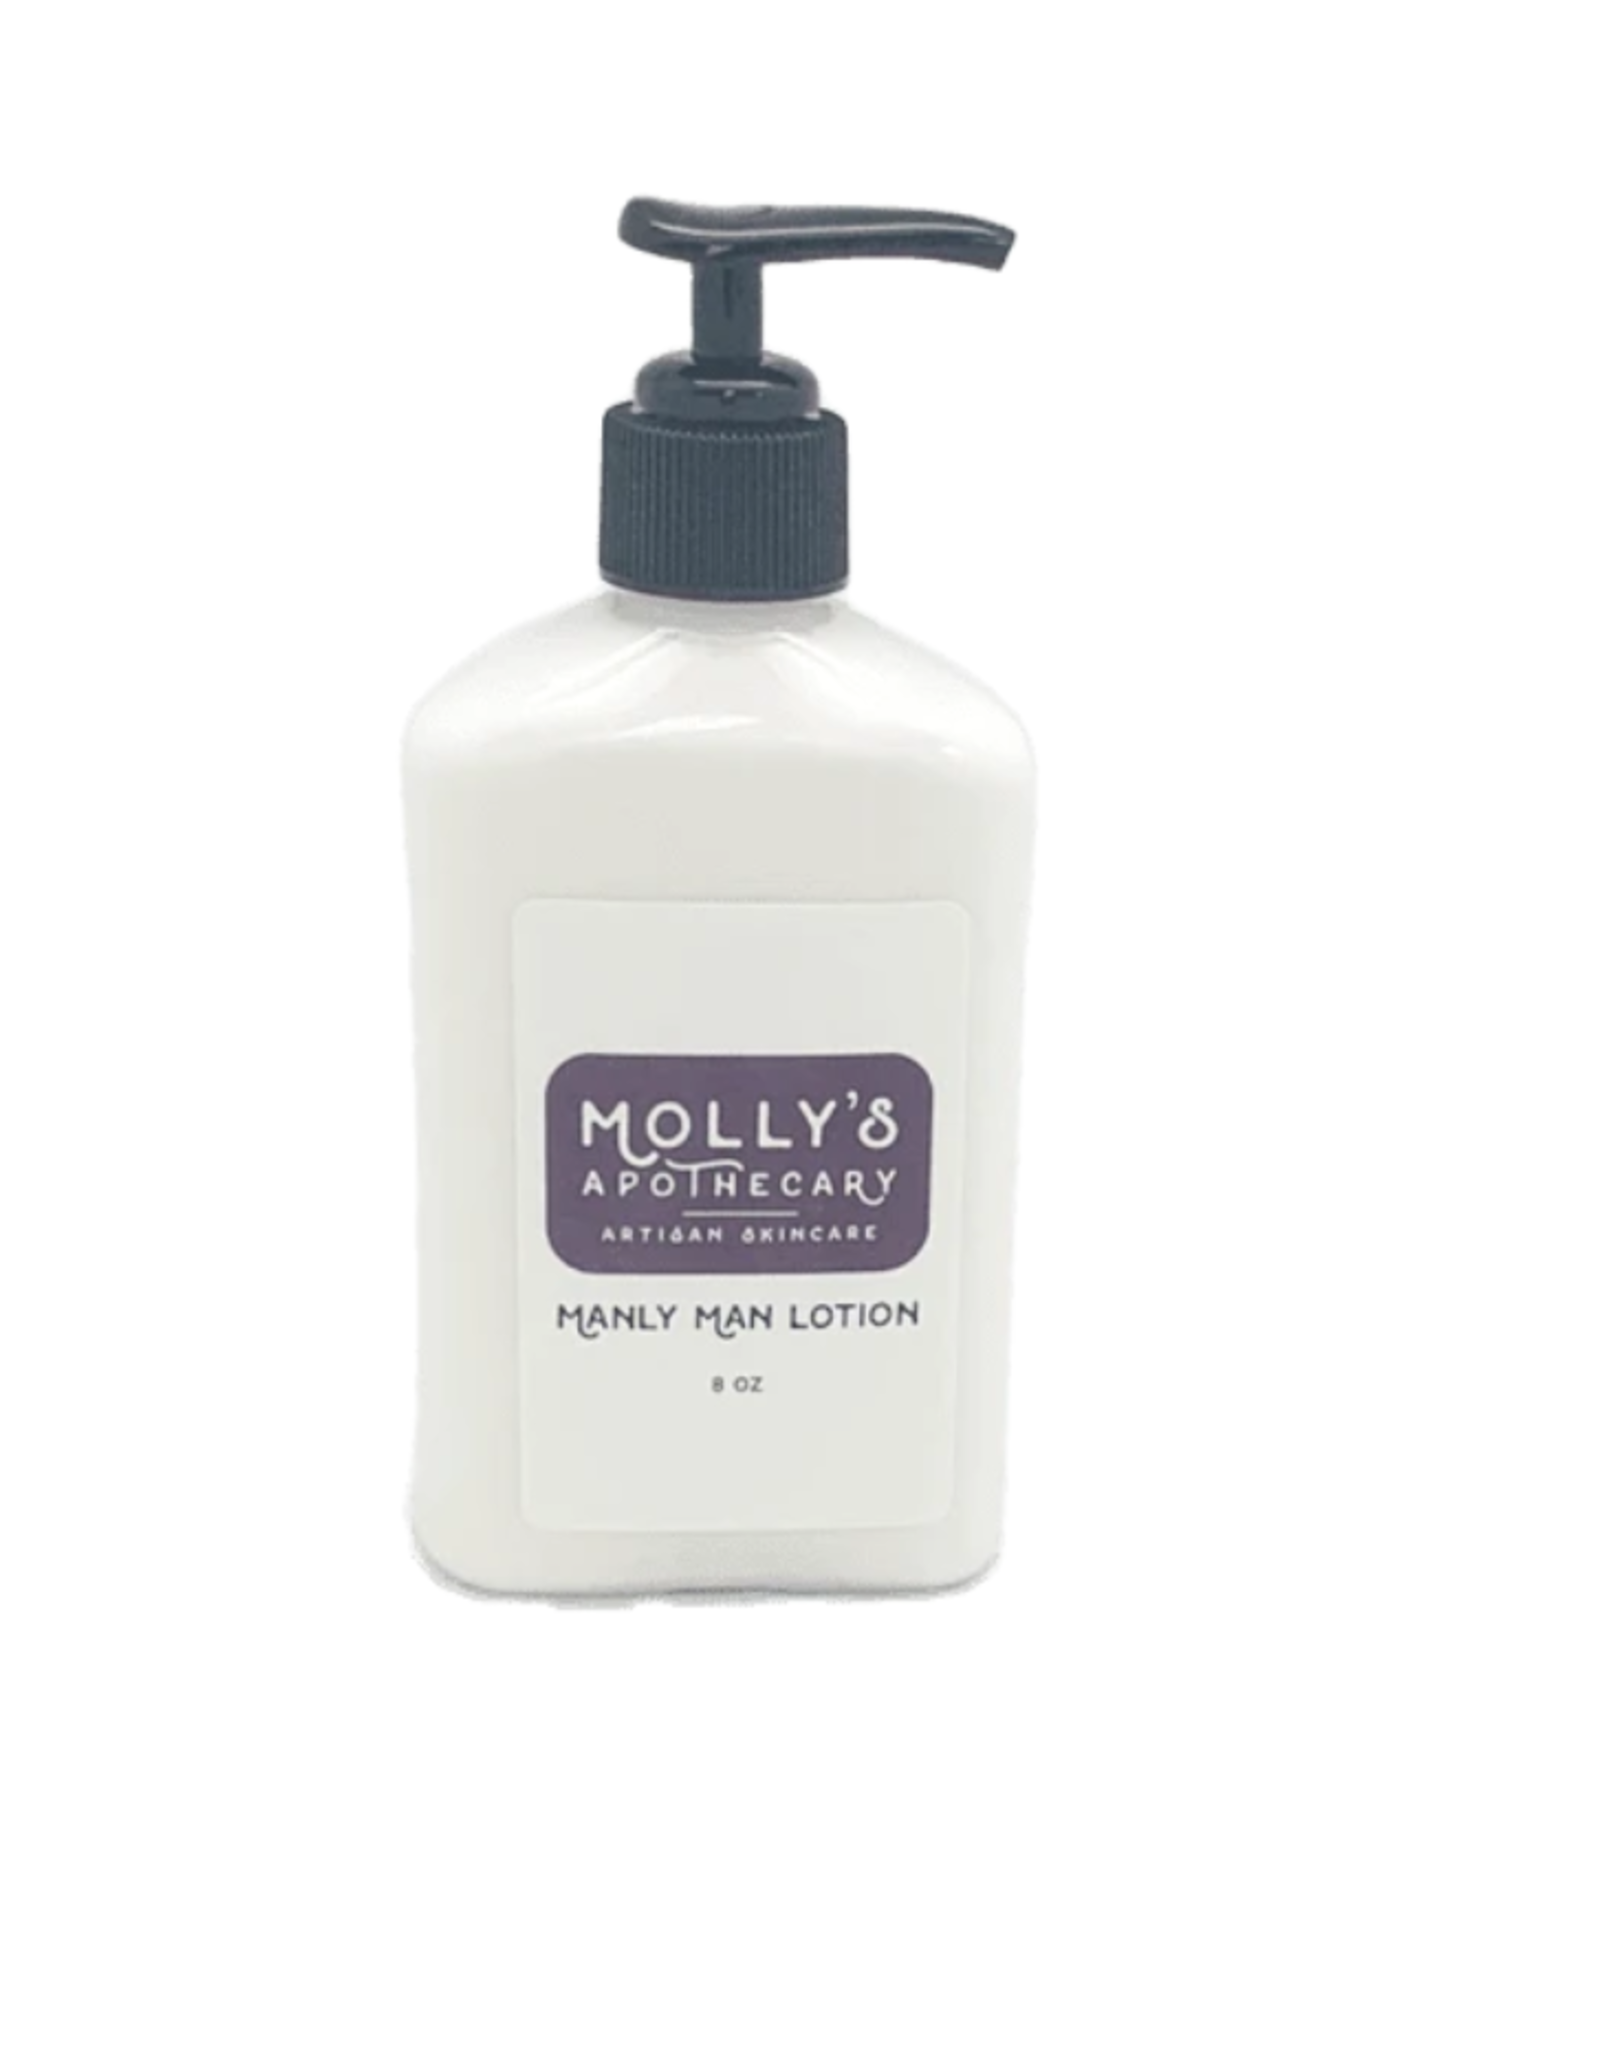 Molly's Apothecary Molly's Apothecary - Manly Man Lotion 8oz